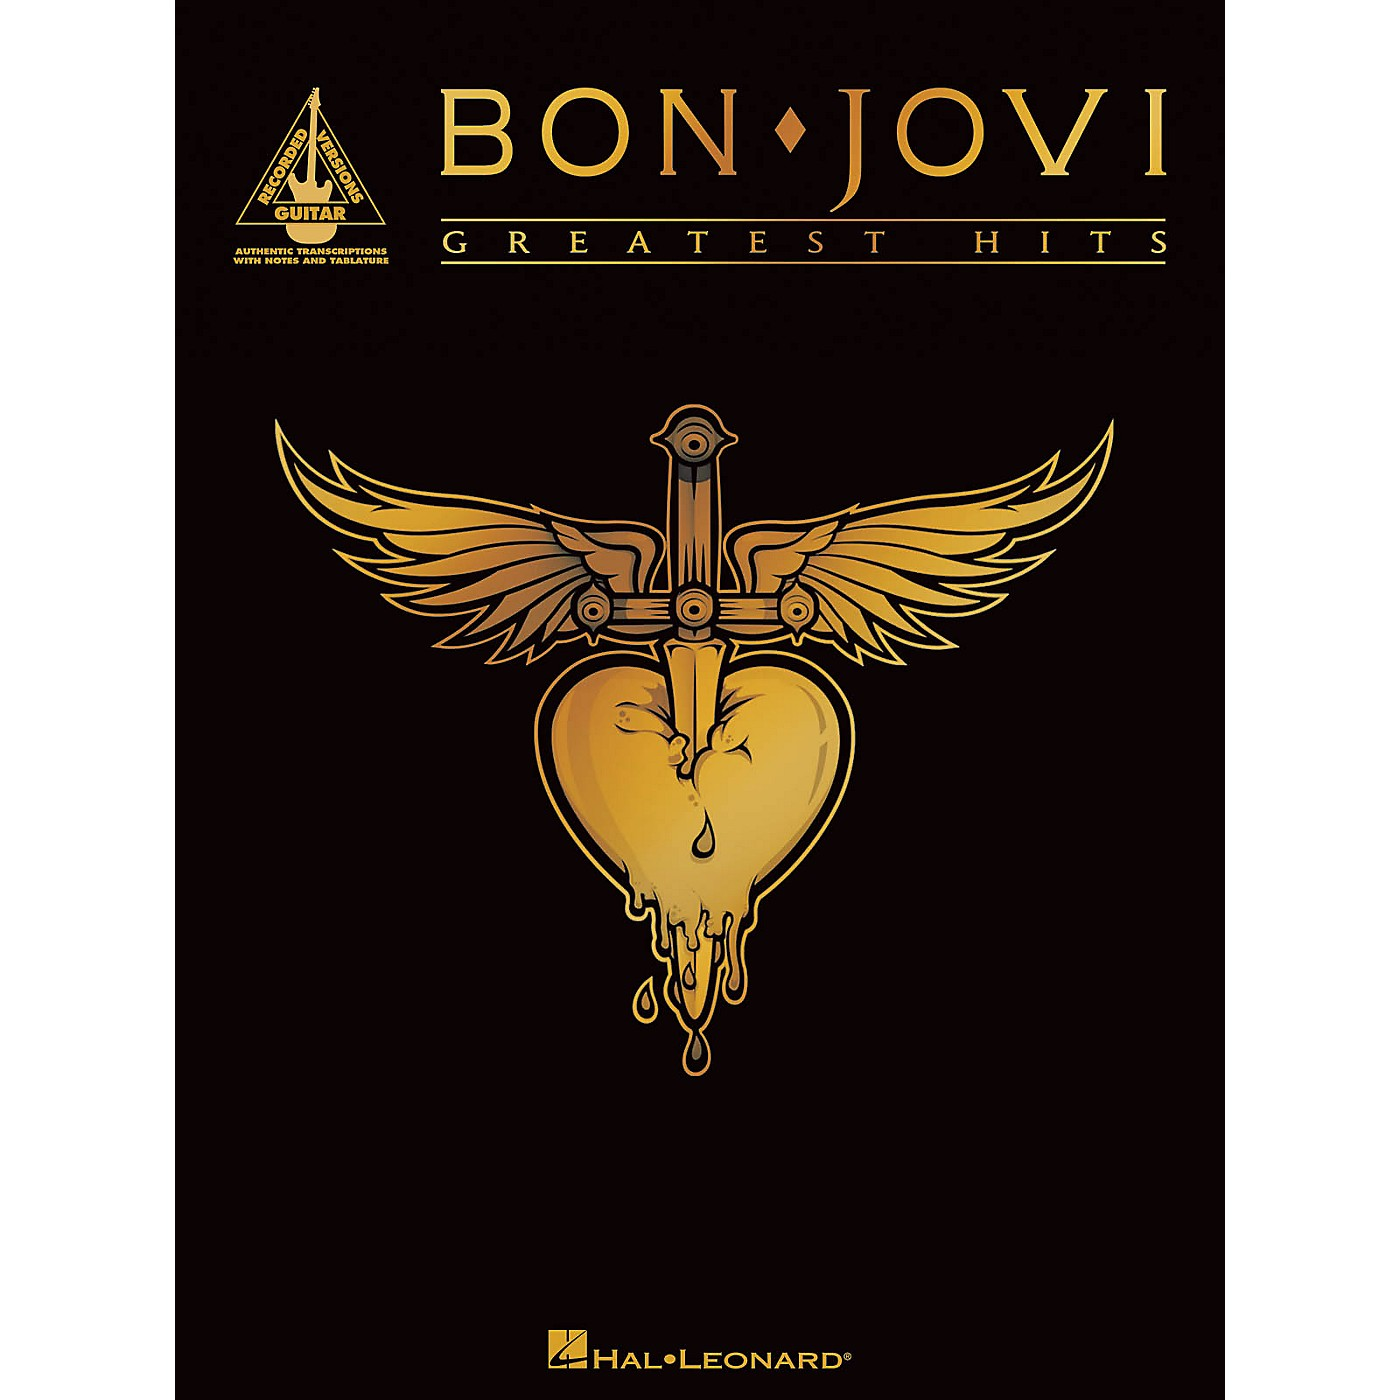 Hal Leonard Bon Jovi - Greatest Hits Guitar Tab Songbook thumbnail